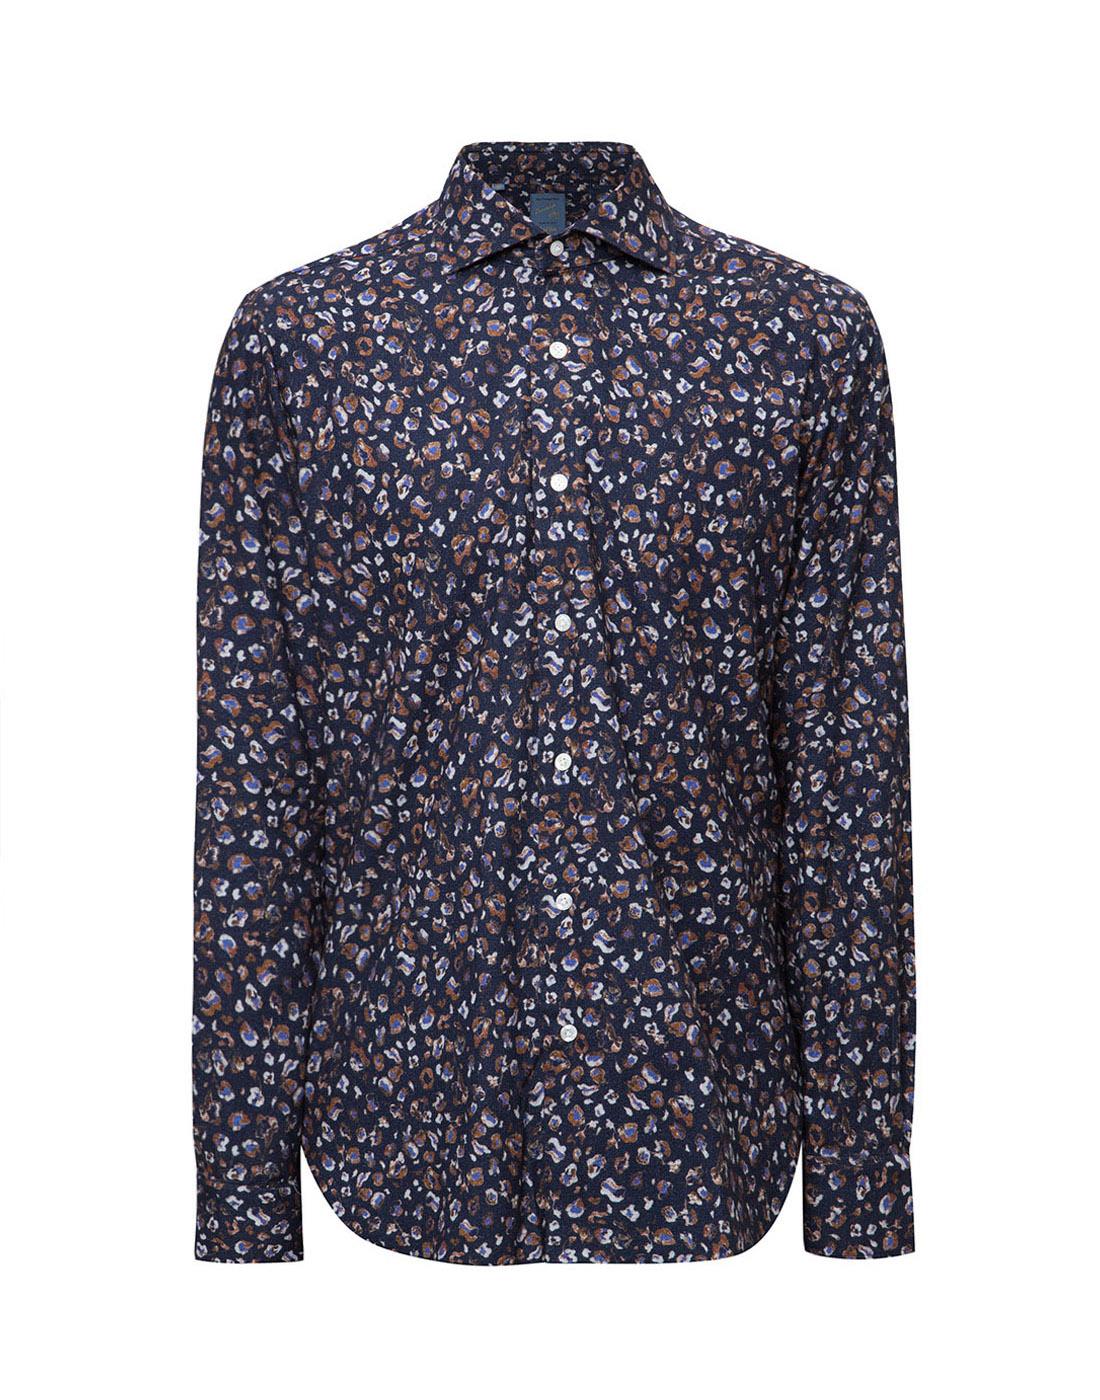 Мужская синяя рубашка Barba SD2U133606501U-1